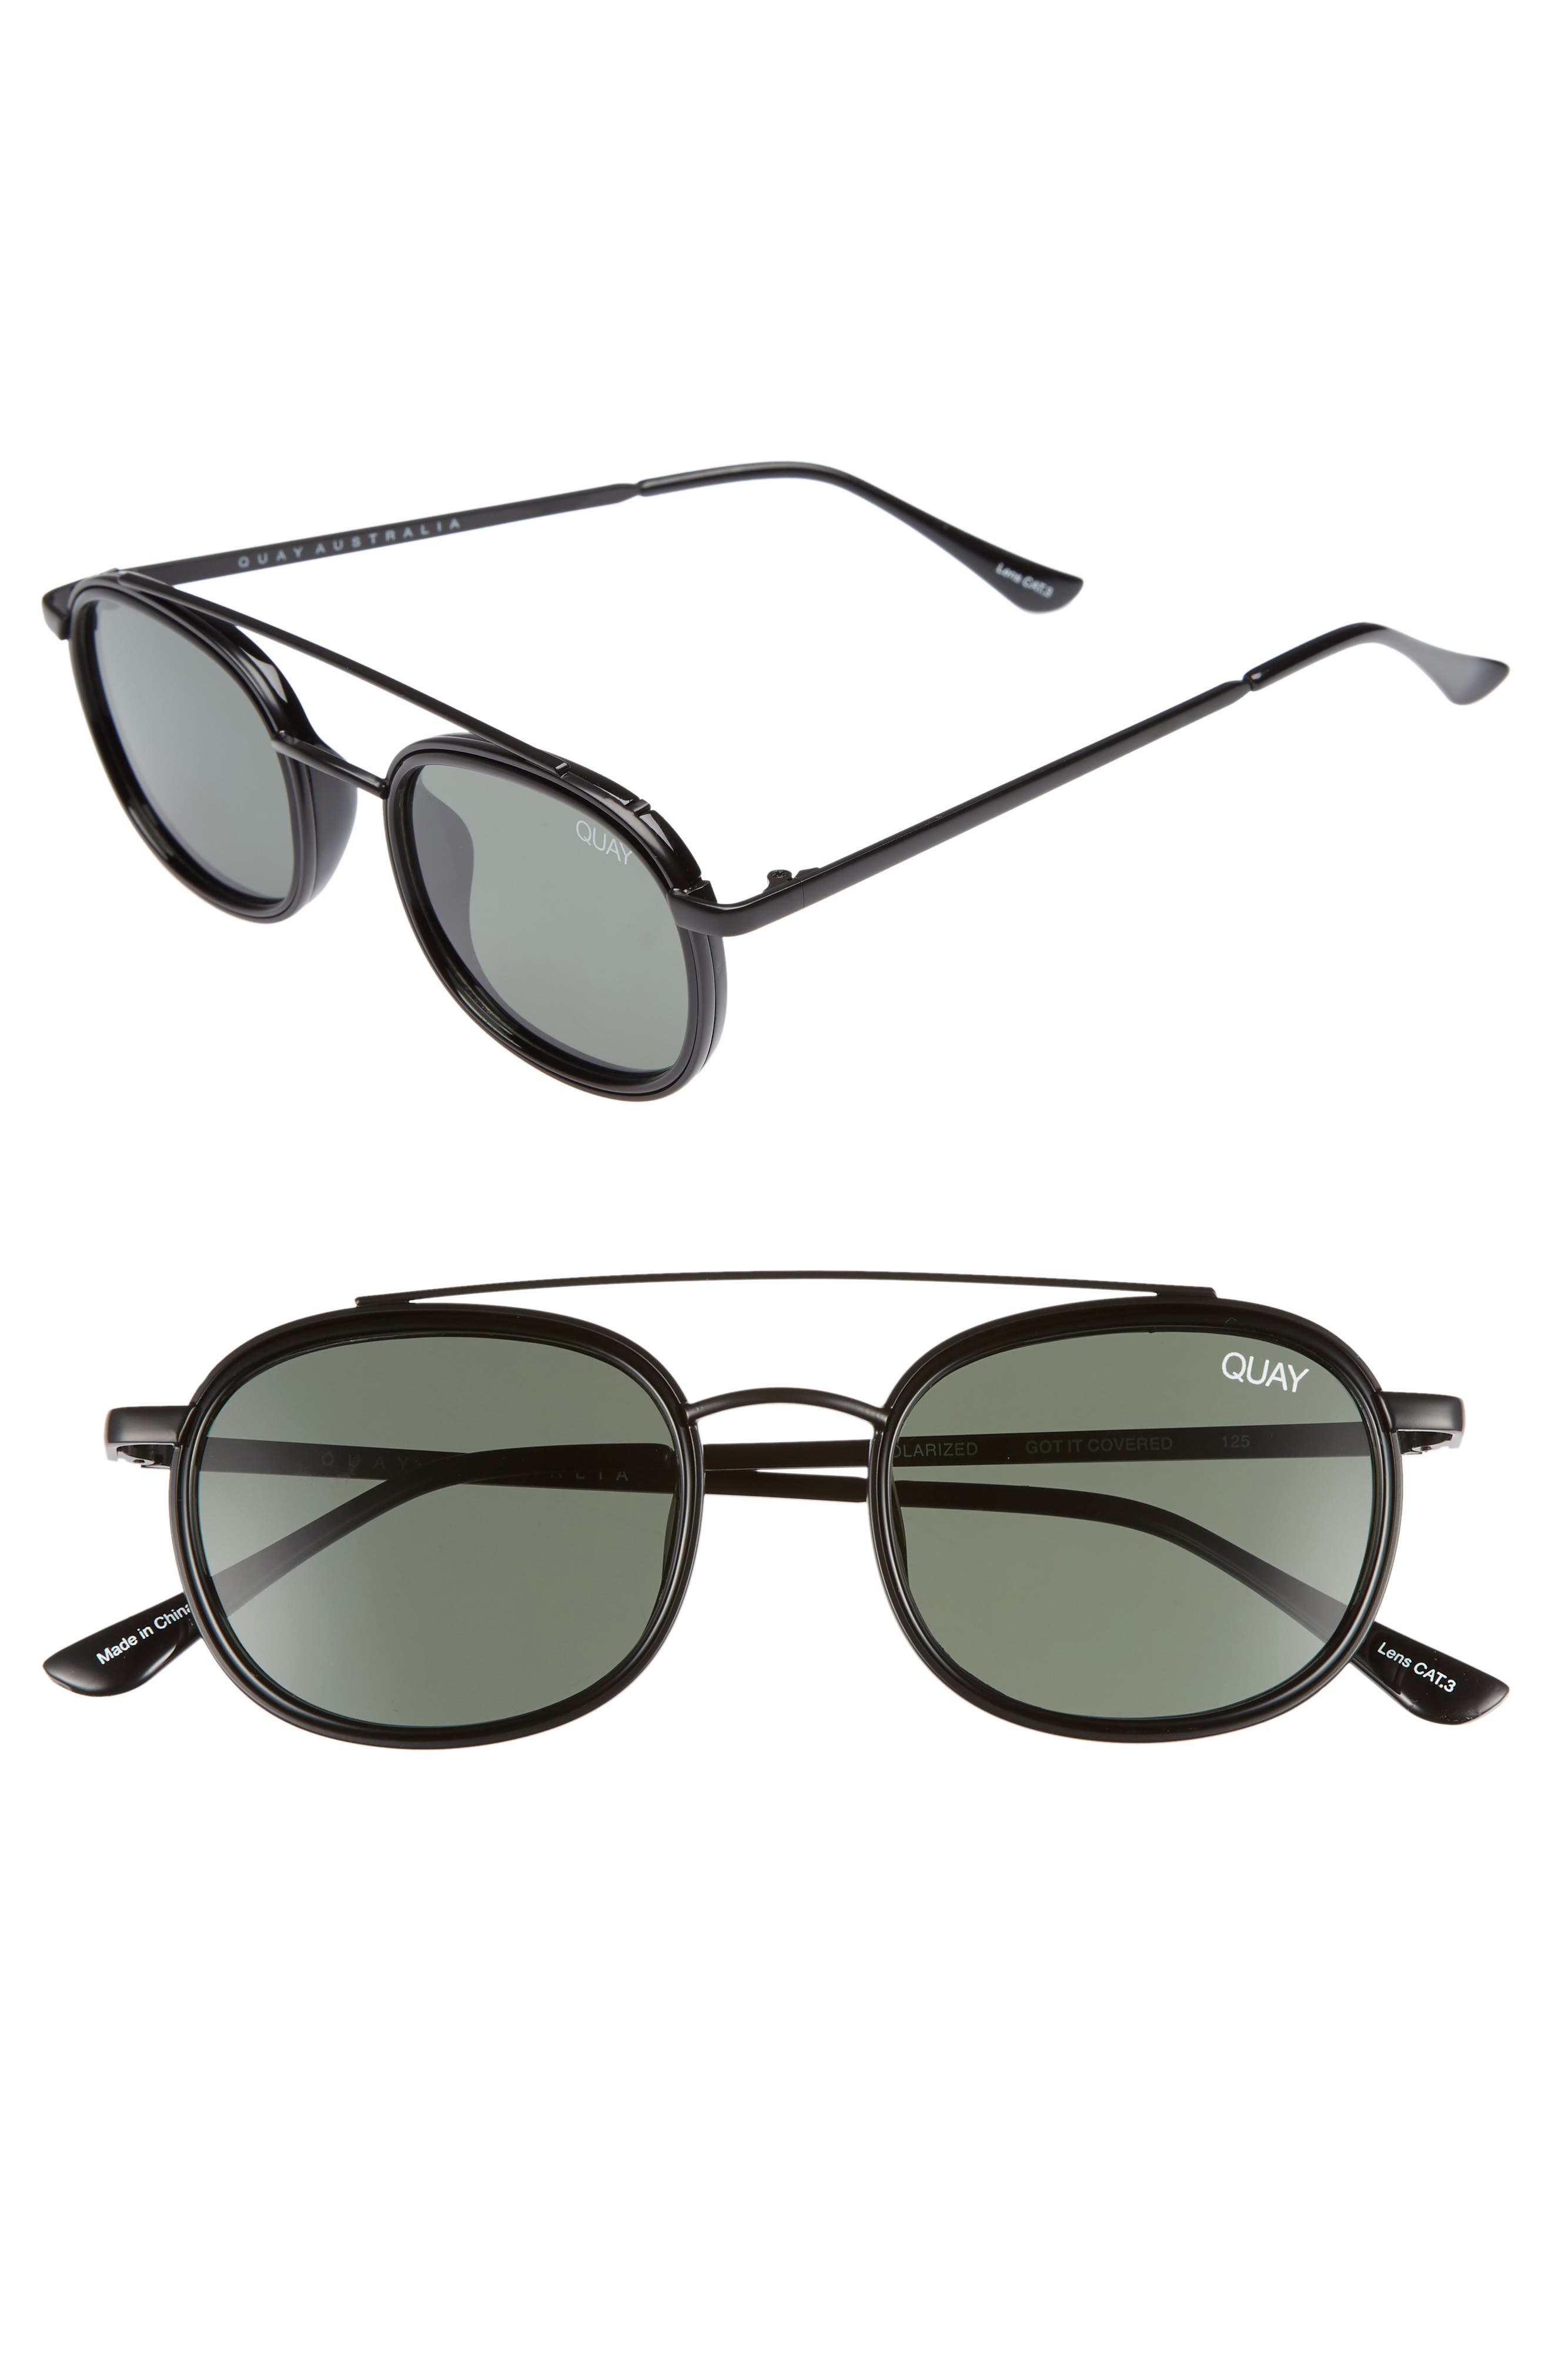 5c7a3658d7 Quay Got It Covered 50Mm Polarized Sunglasses - Black   Green Lens ...